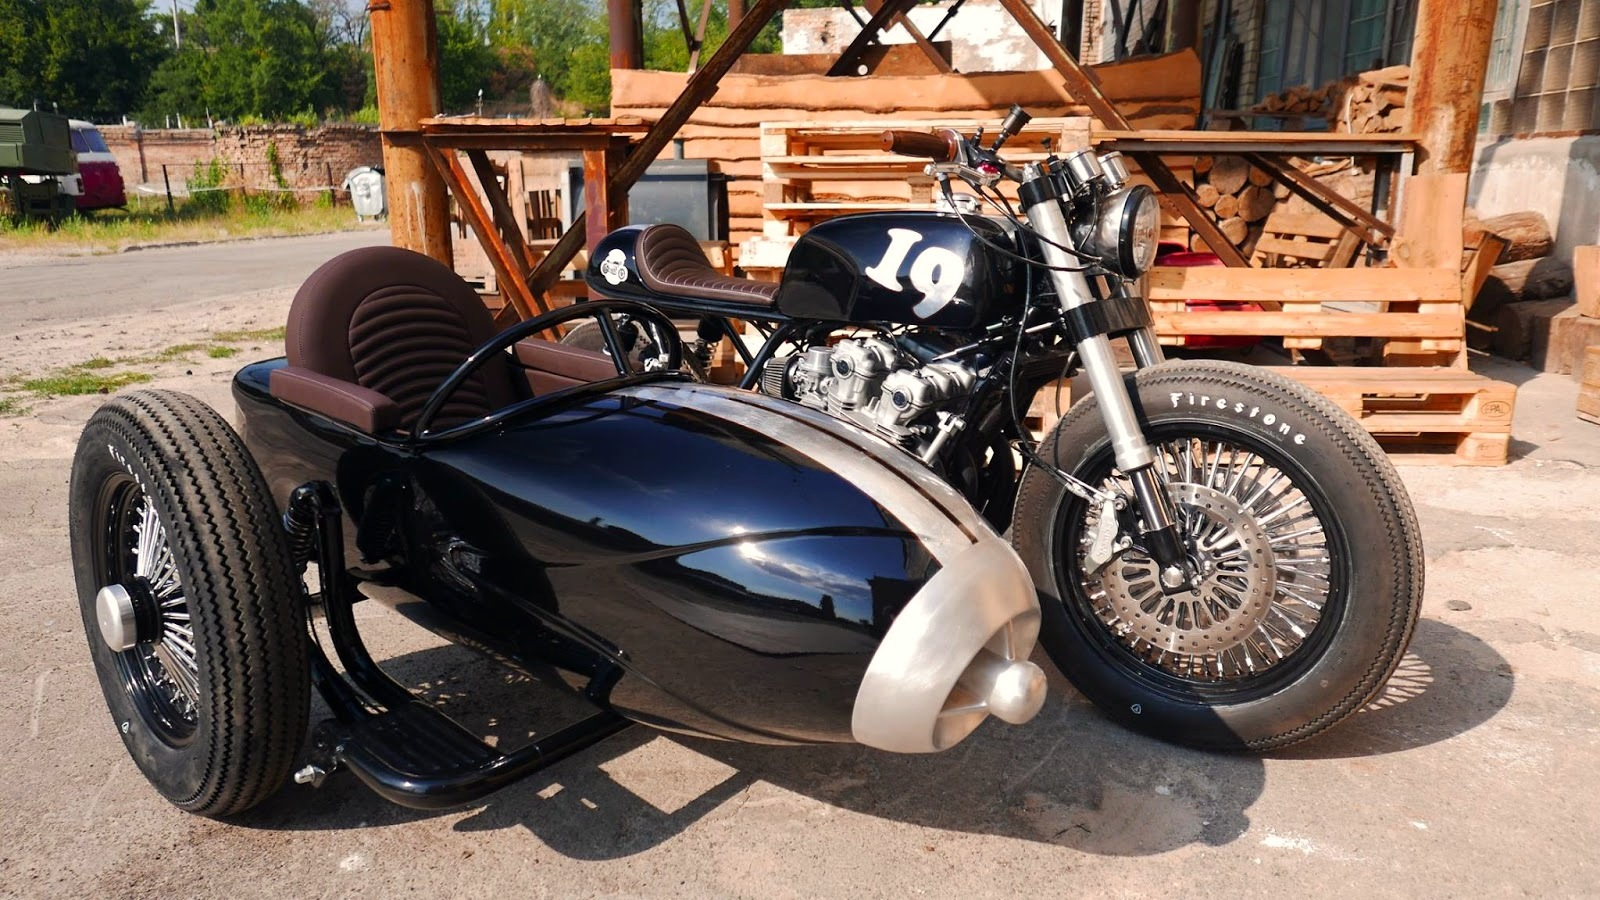 http://2.bp.blogspot.com/-z_EtqKoZgBs/Ve_fitijufI/AAAAAAACID8/fHTBL8j9ucE/s1600/sidecar.jpg